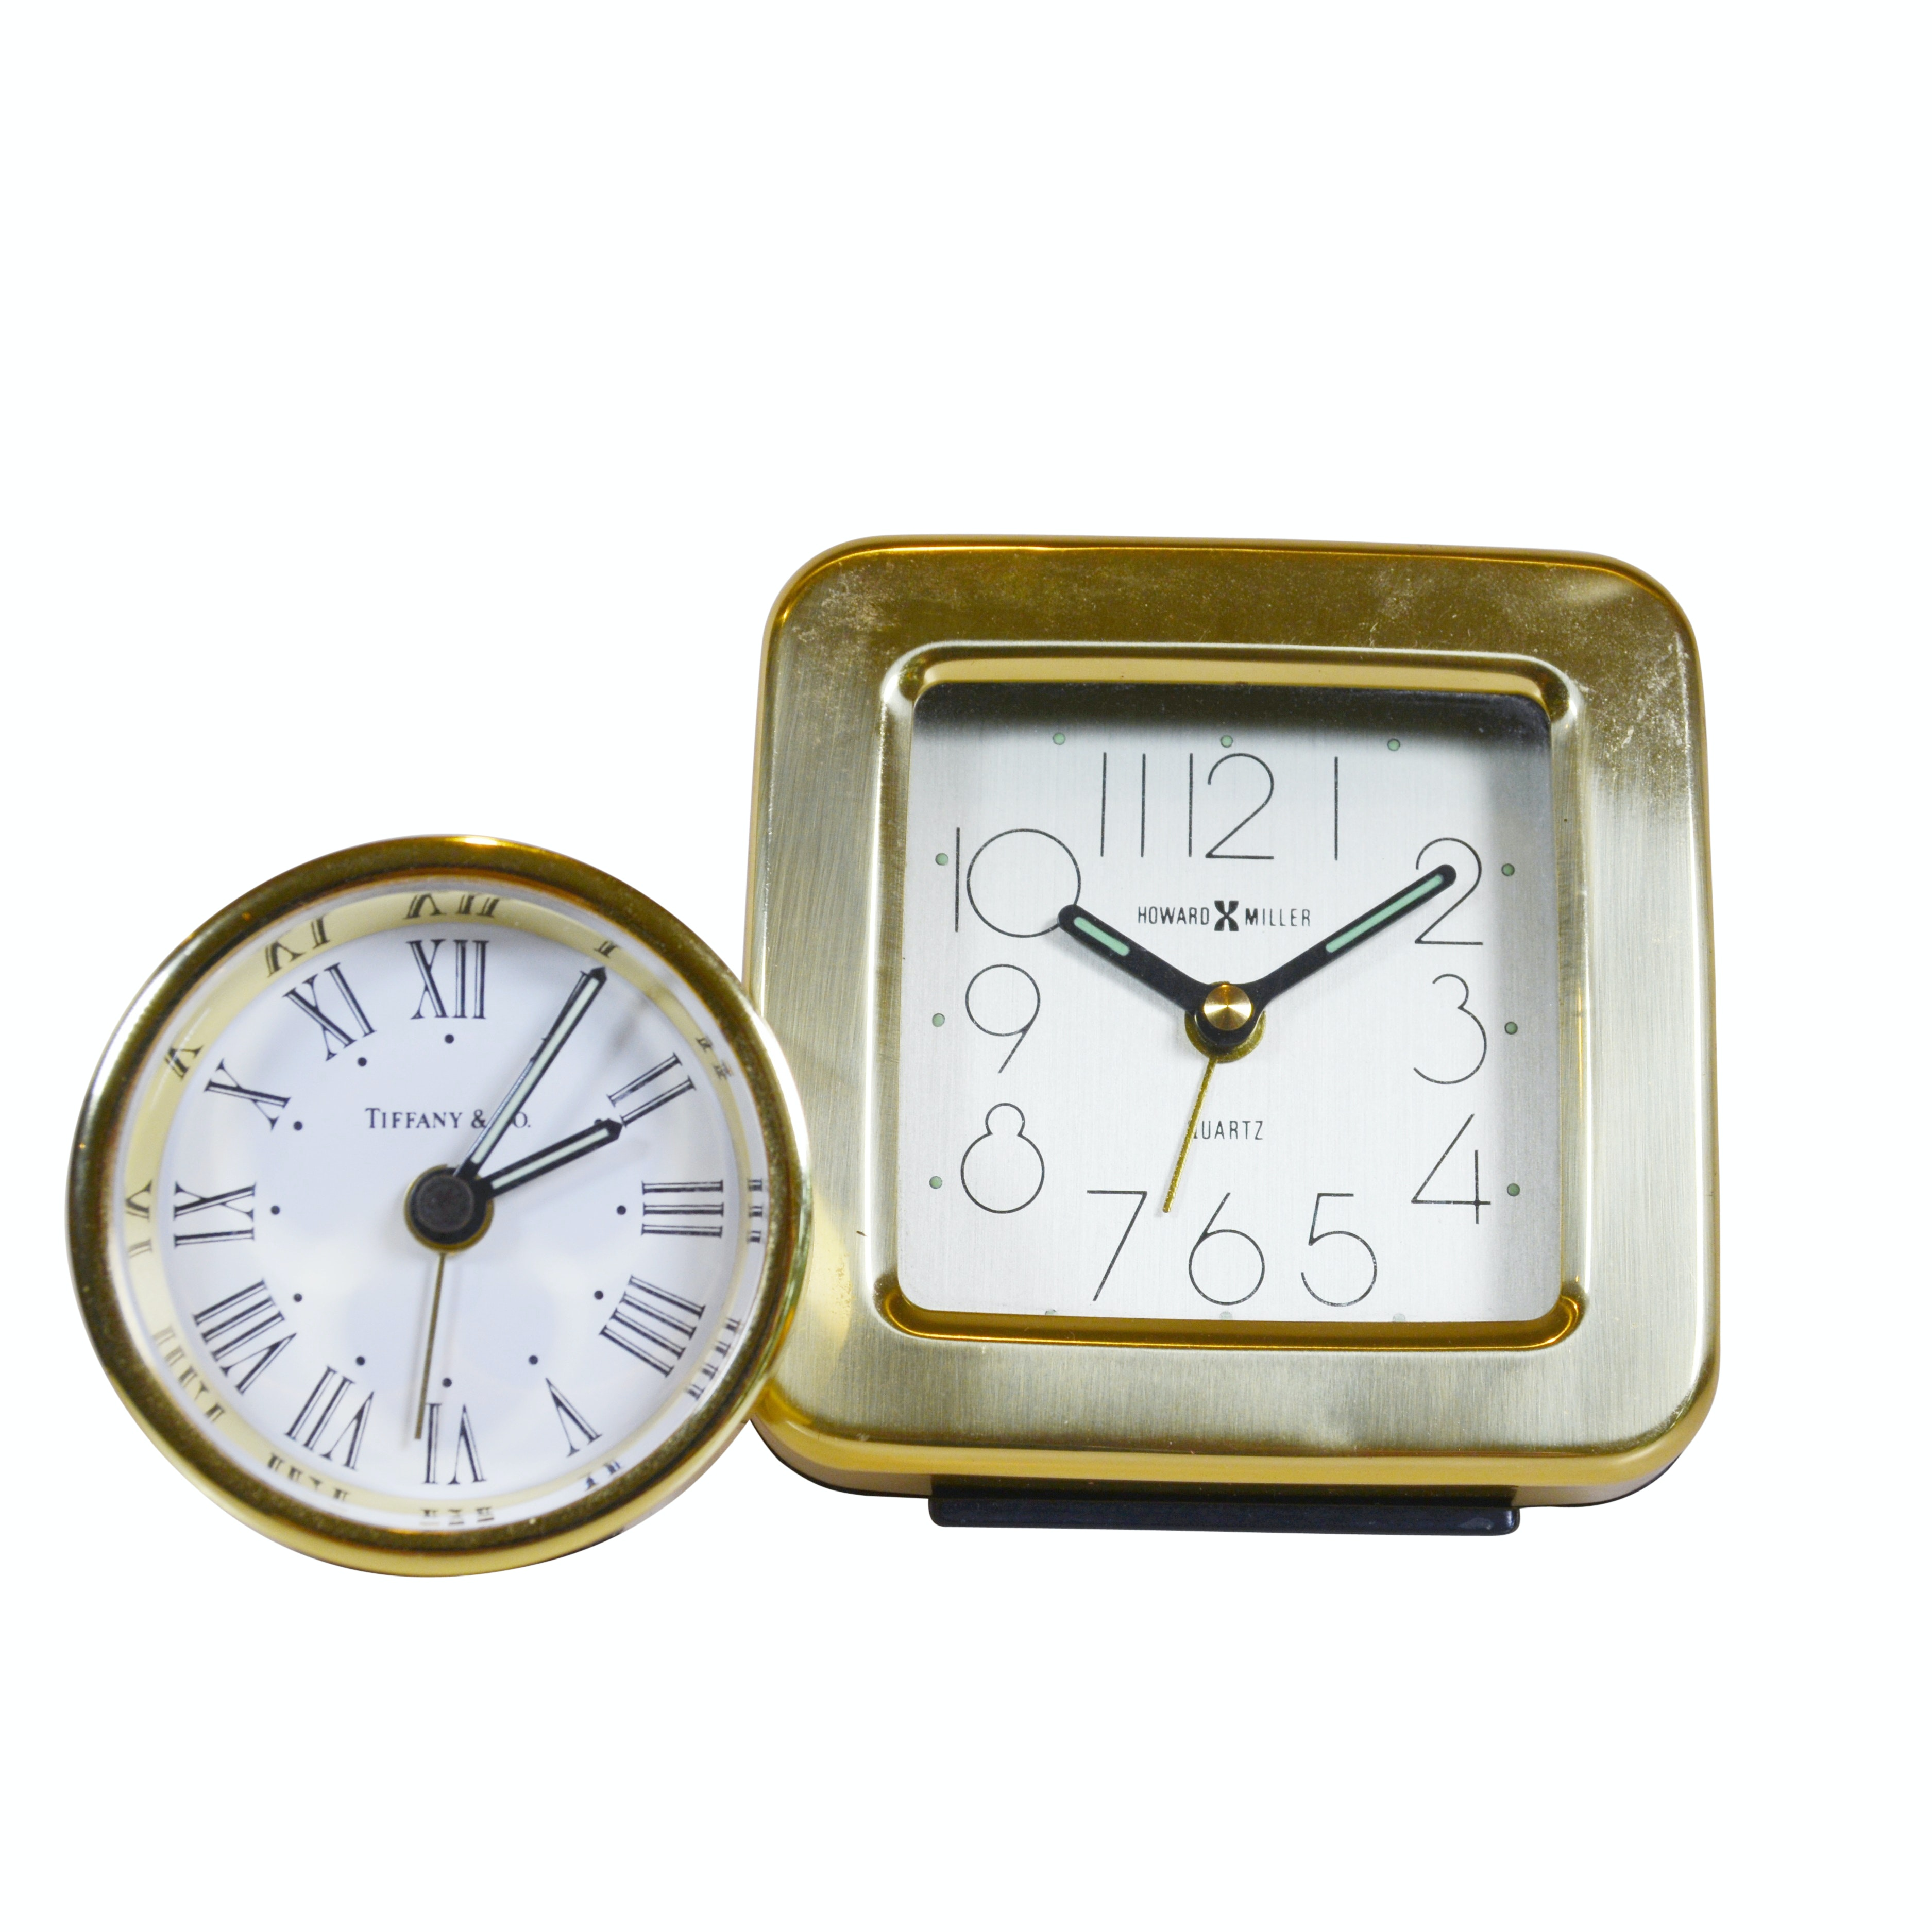 Tiffany & Co. Clock and Howard Miller Quartz Desk Clocks